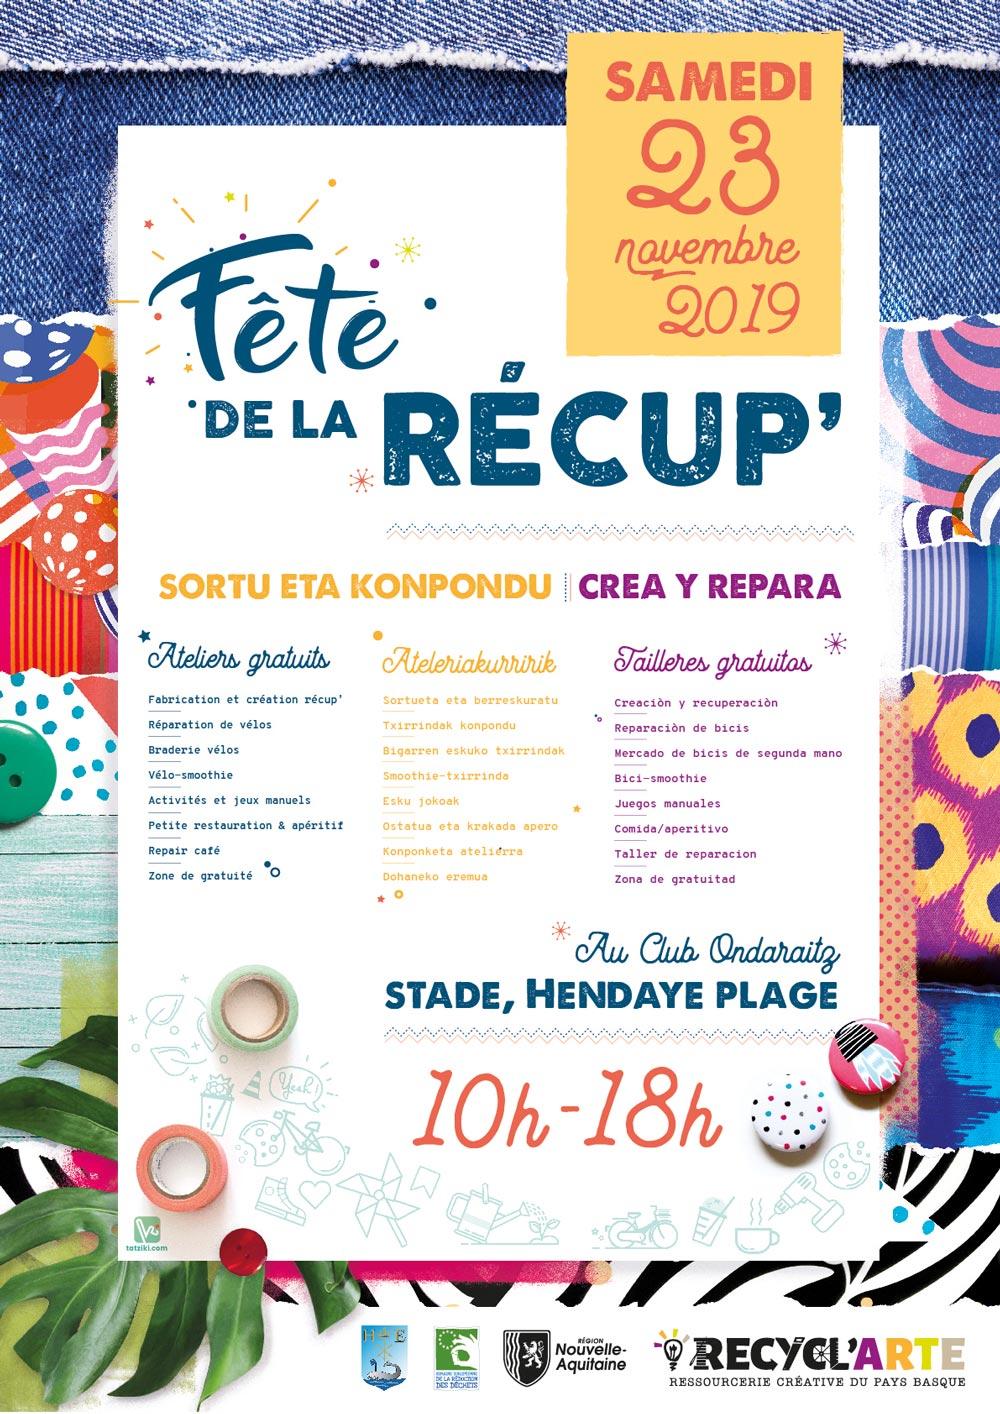 Extrait Fête de la récup 2019 - Association Recyclarte Hendaye Tatziki